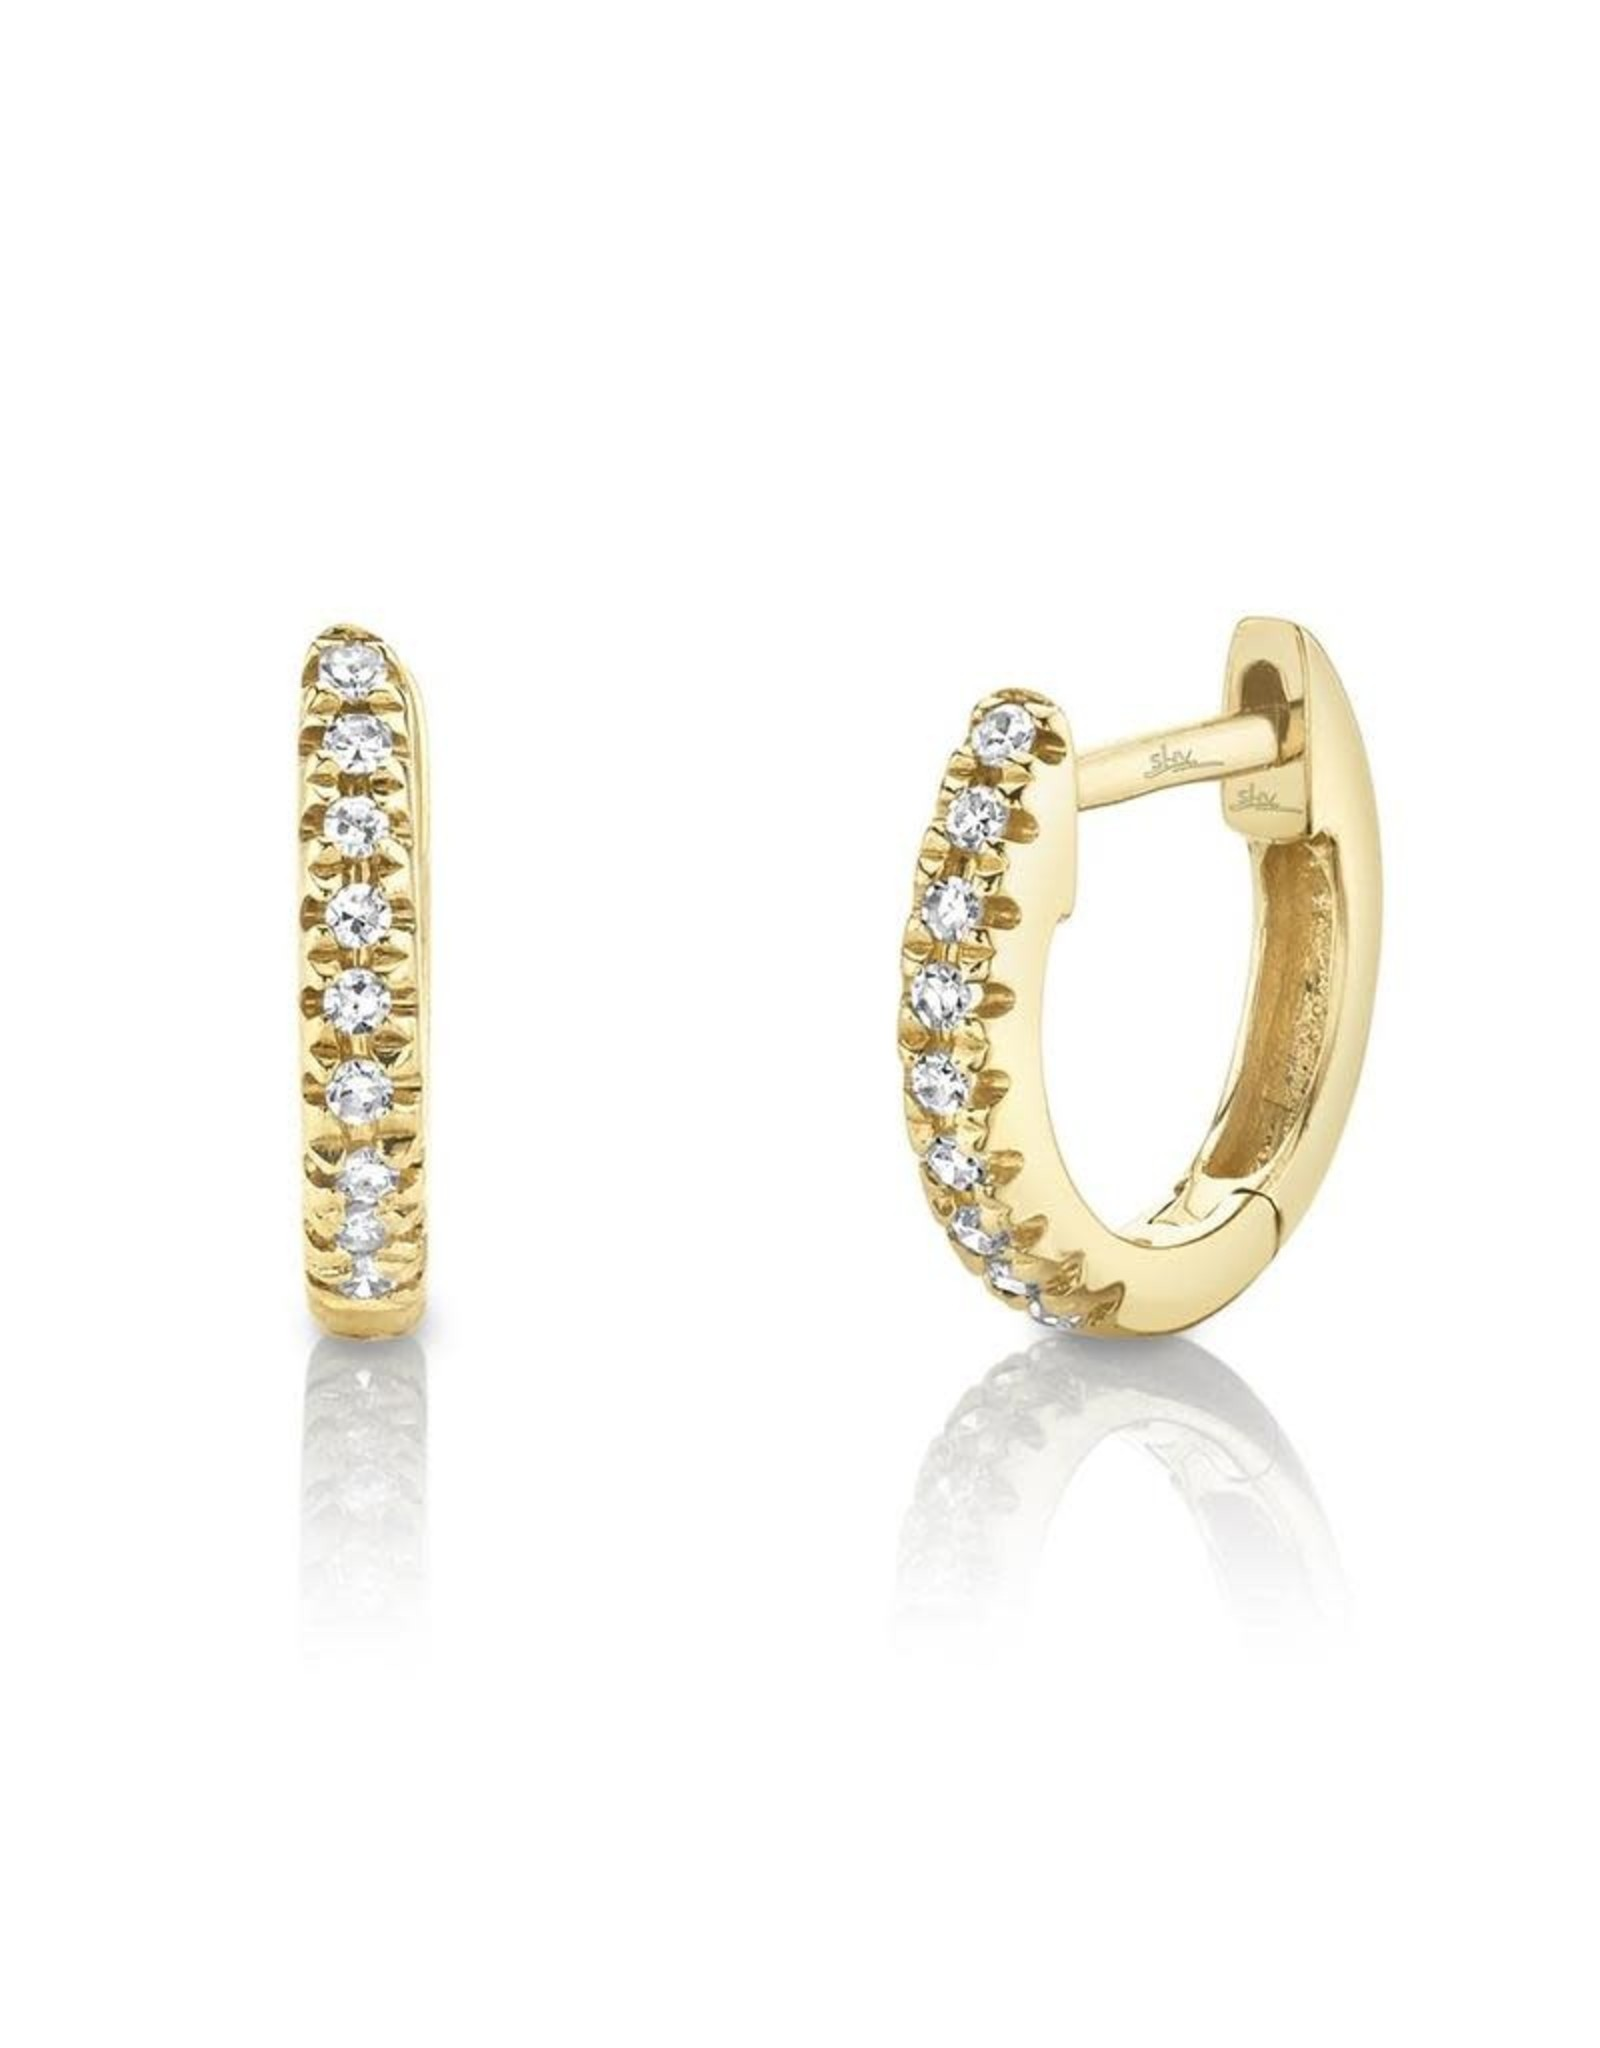 14K Yellow Gold Petite Diamond Huggies, D: 0.04ct